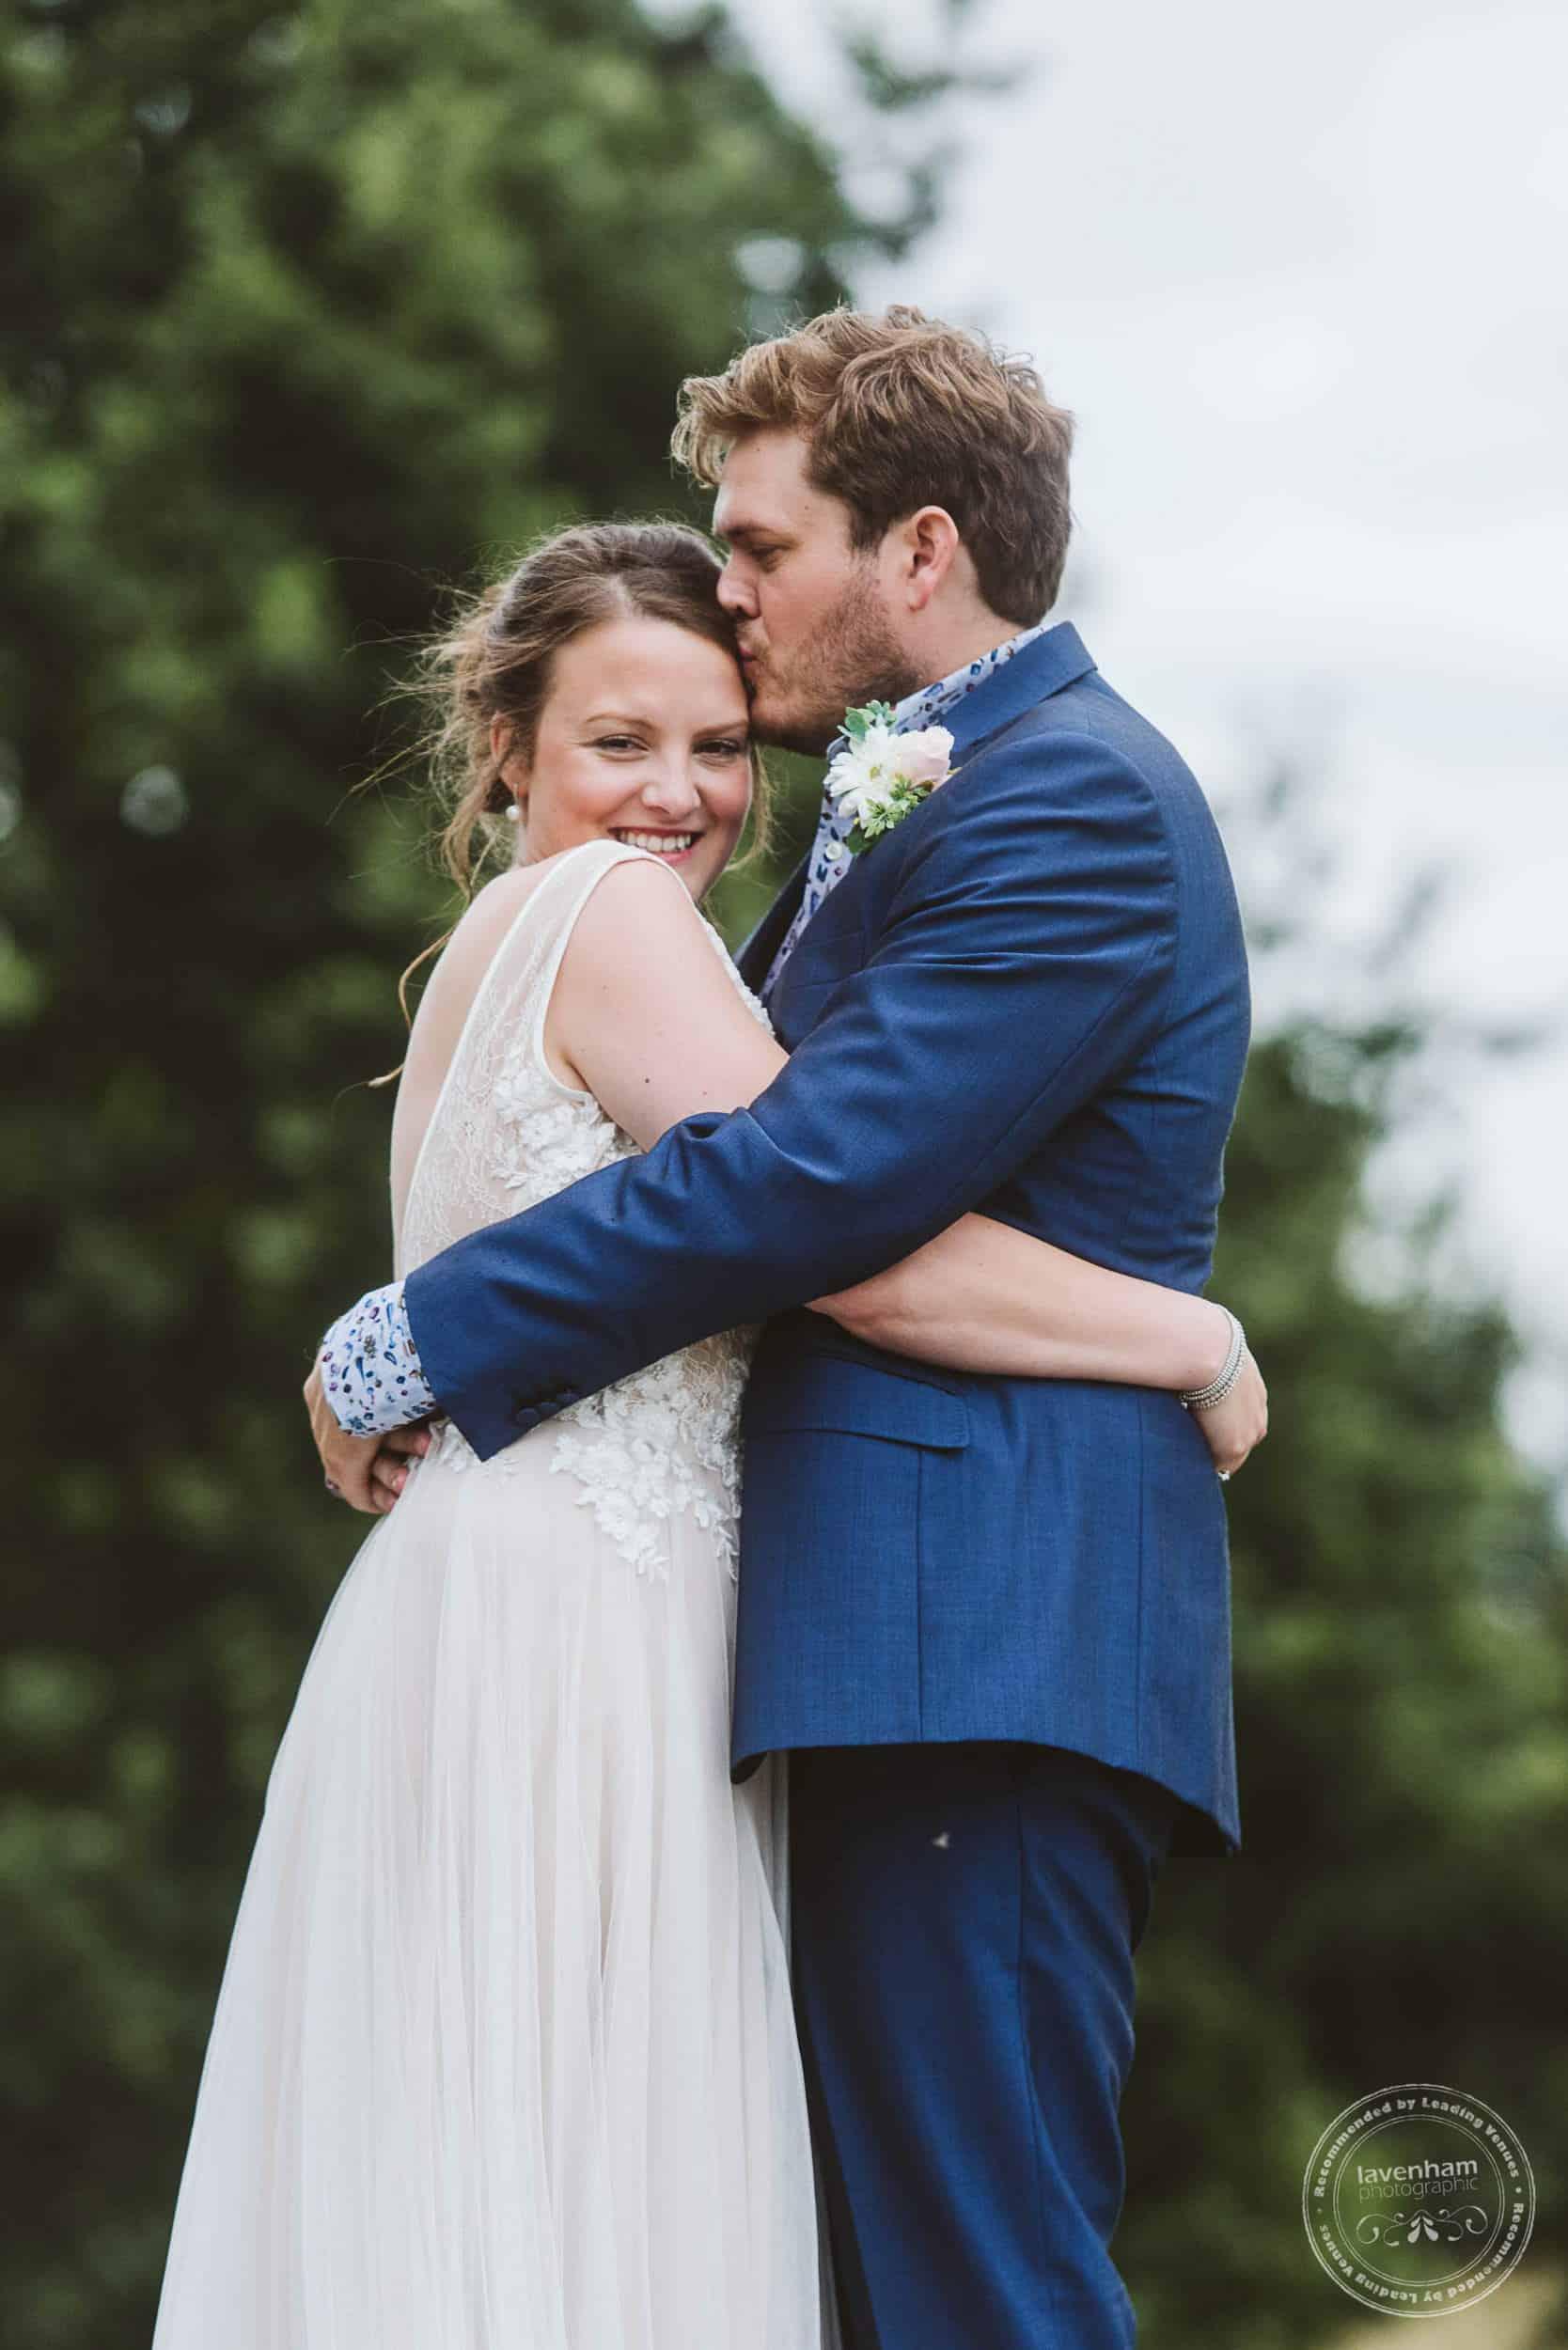 180818 Marks Hall Wedding Photography Lavenham Photographic 094